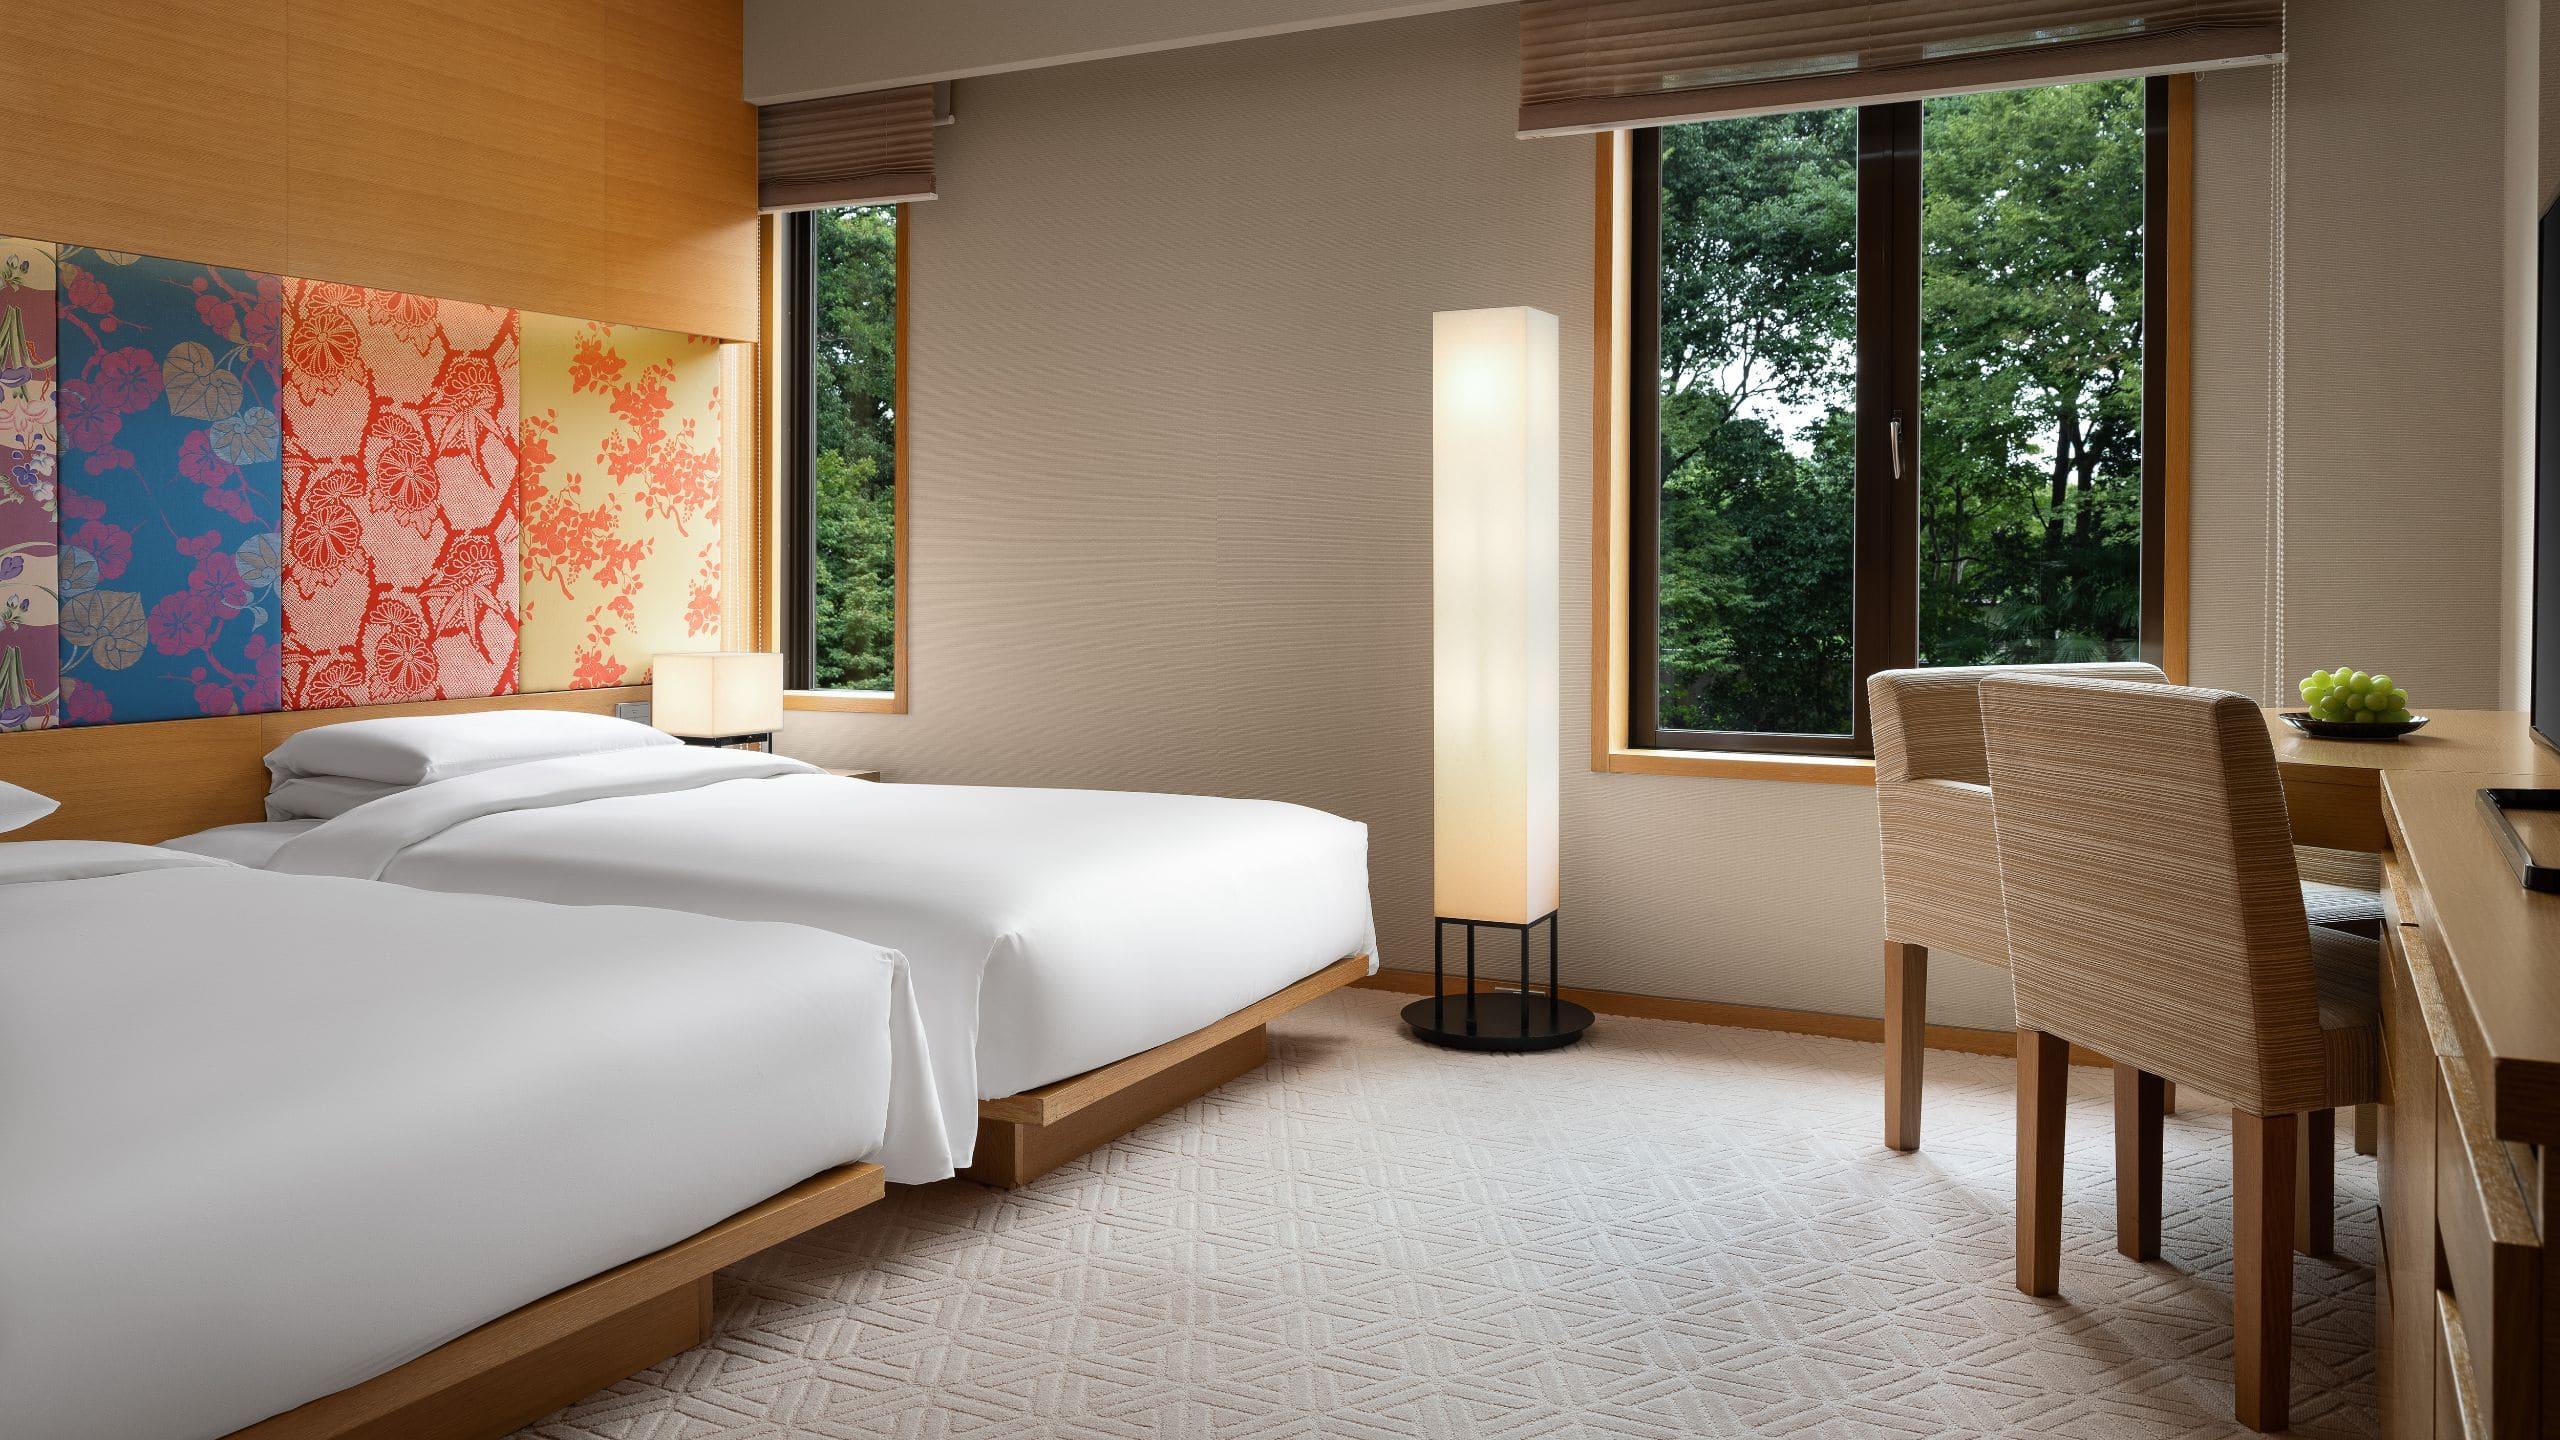 Luxury Accomodation Suites At Kyoto Hotel Japan Hyatt Regency Kyoto